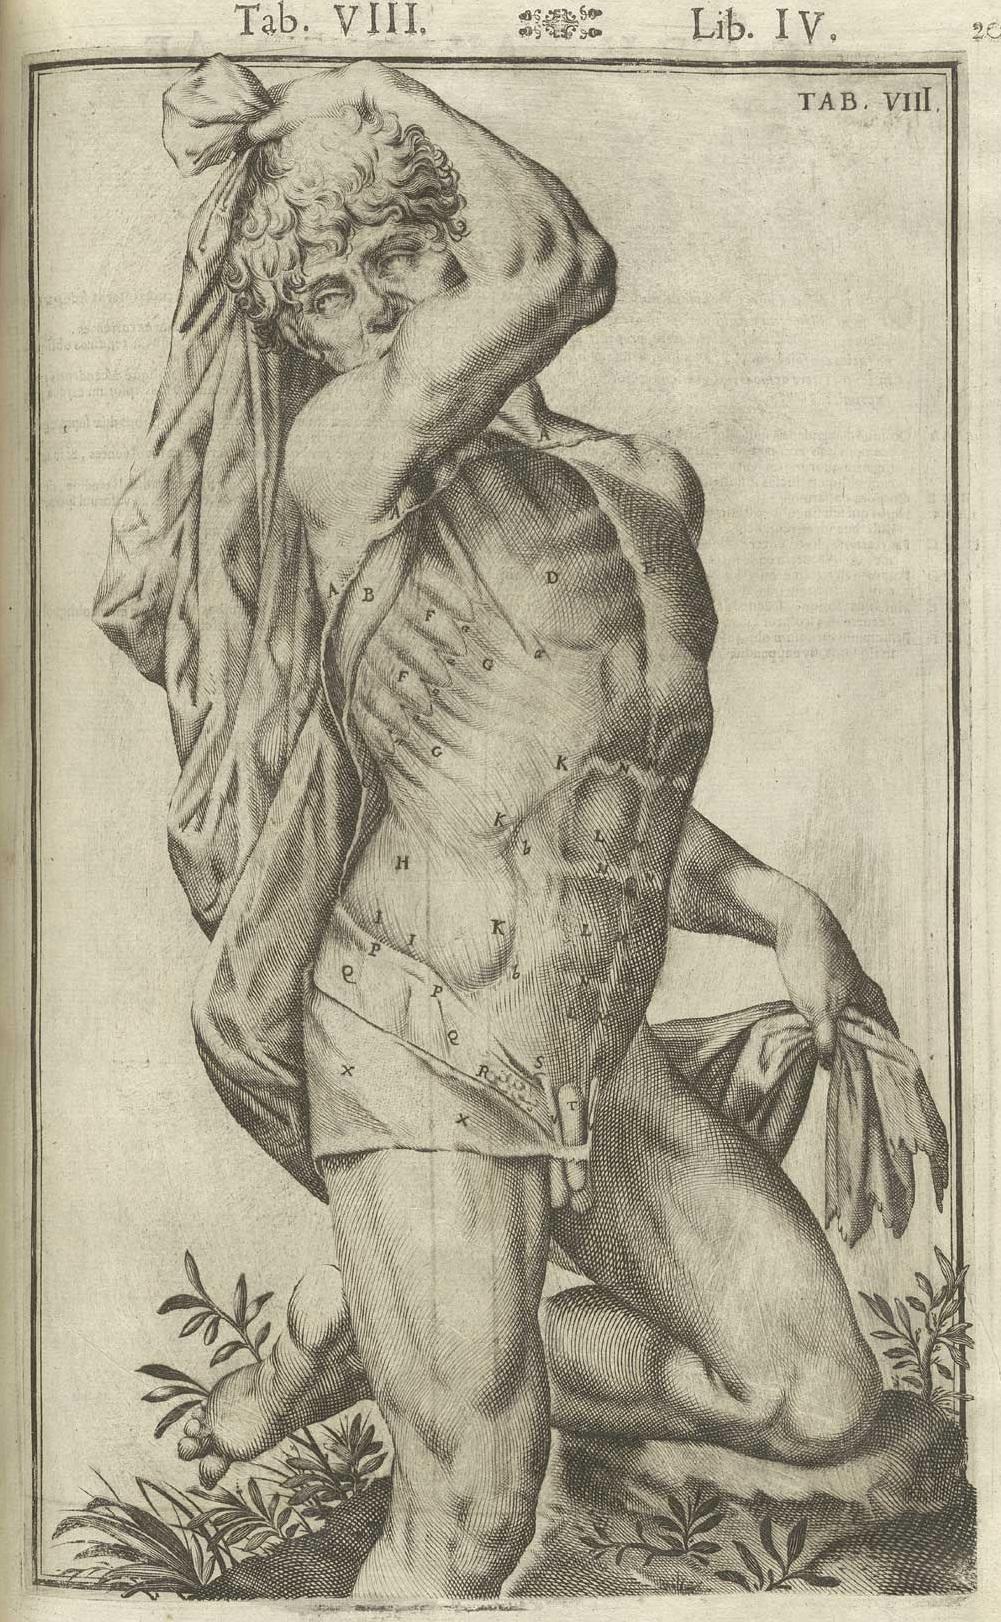 Giulio Cesare Casseri, Tabulae anatomicae, 1627, incisione di Francesco Valesio